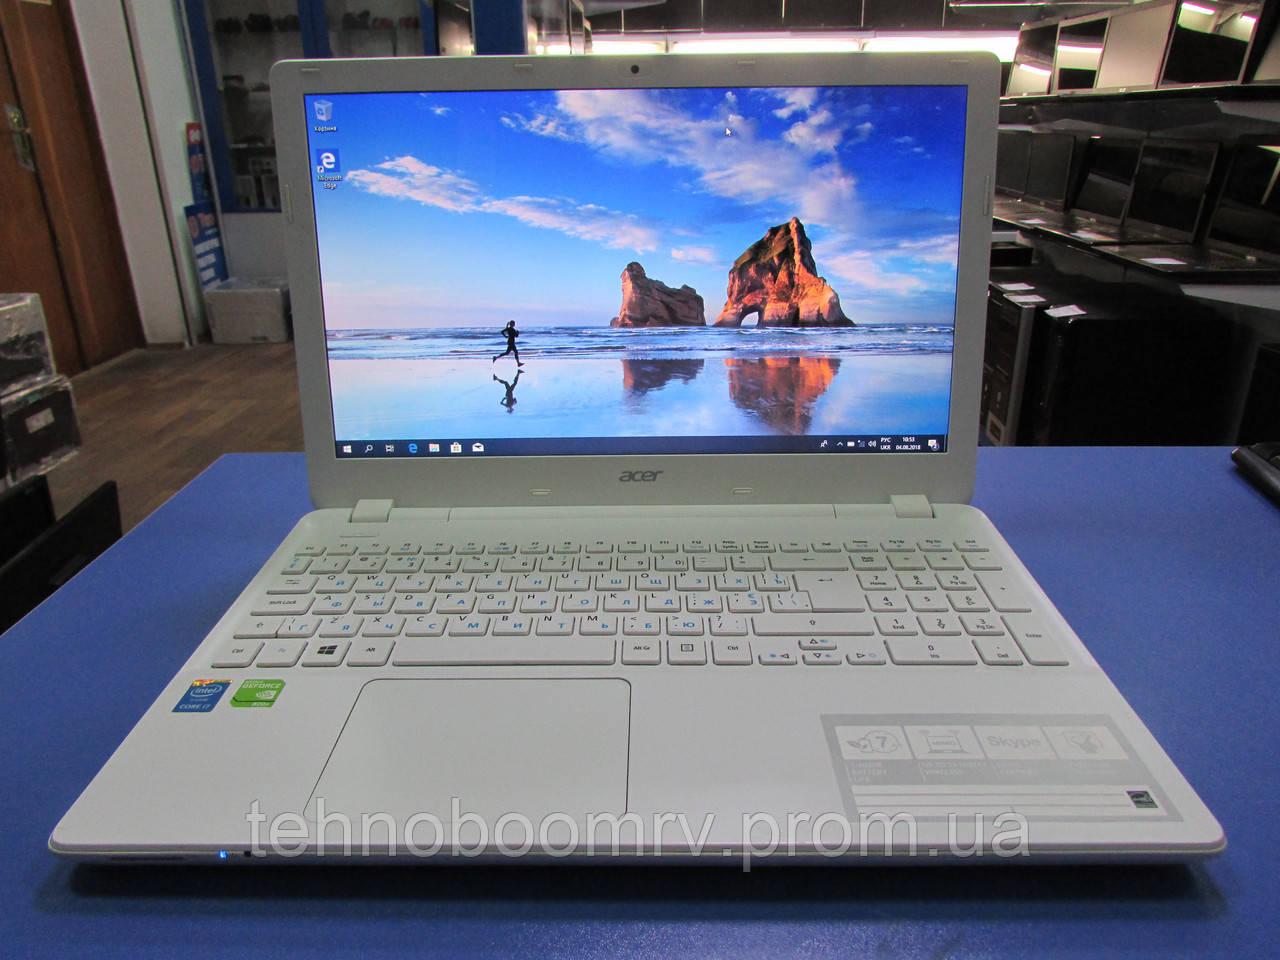 Белый Acer V3-572G - Intel i7-4510U 3.1GHz/DDR3 8GB/GT 840M 2GB